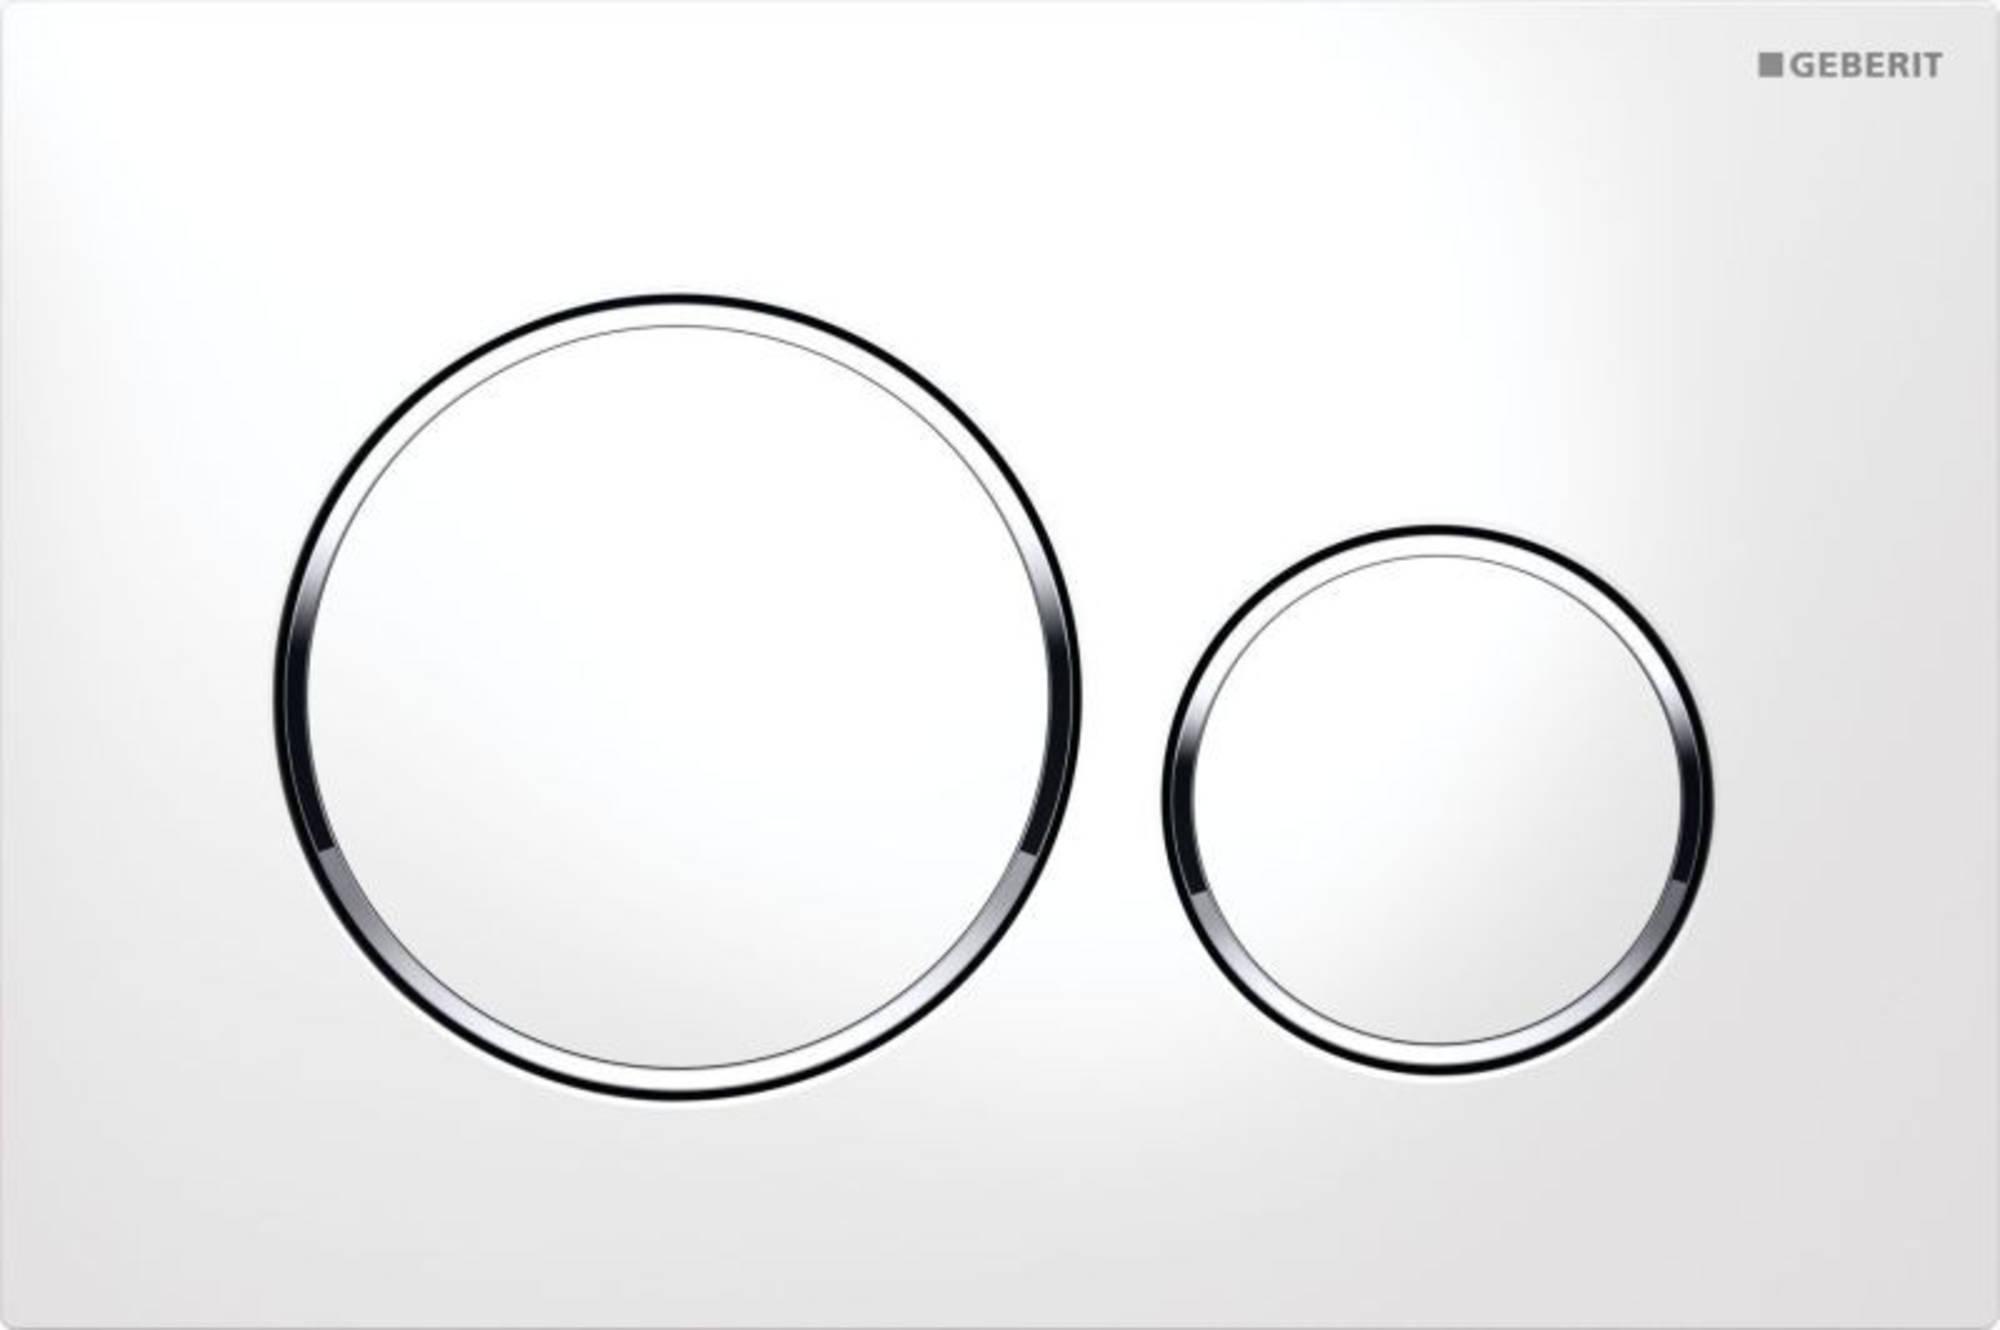 Geberit Sigma 20 bedieningsplaat kleuren:plaat-ring-knop Wit-Chroom-Wit